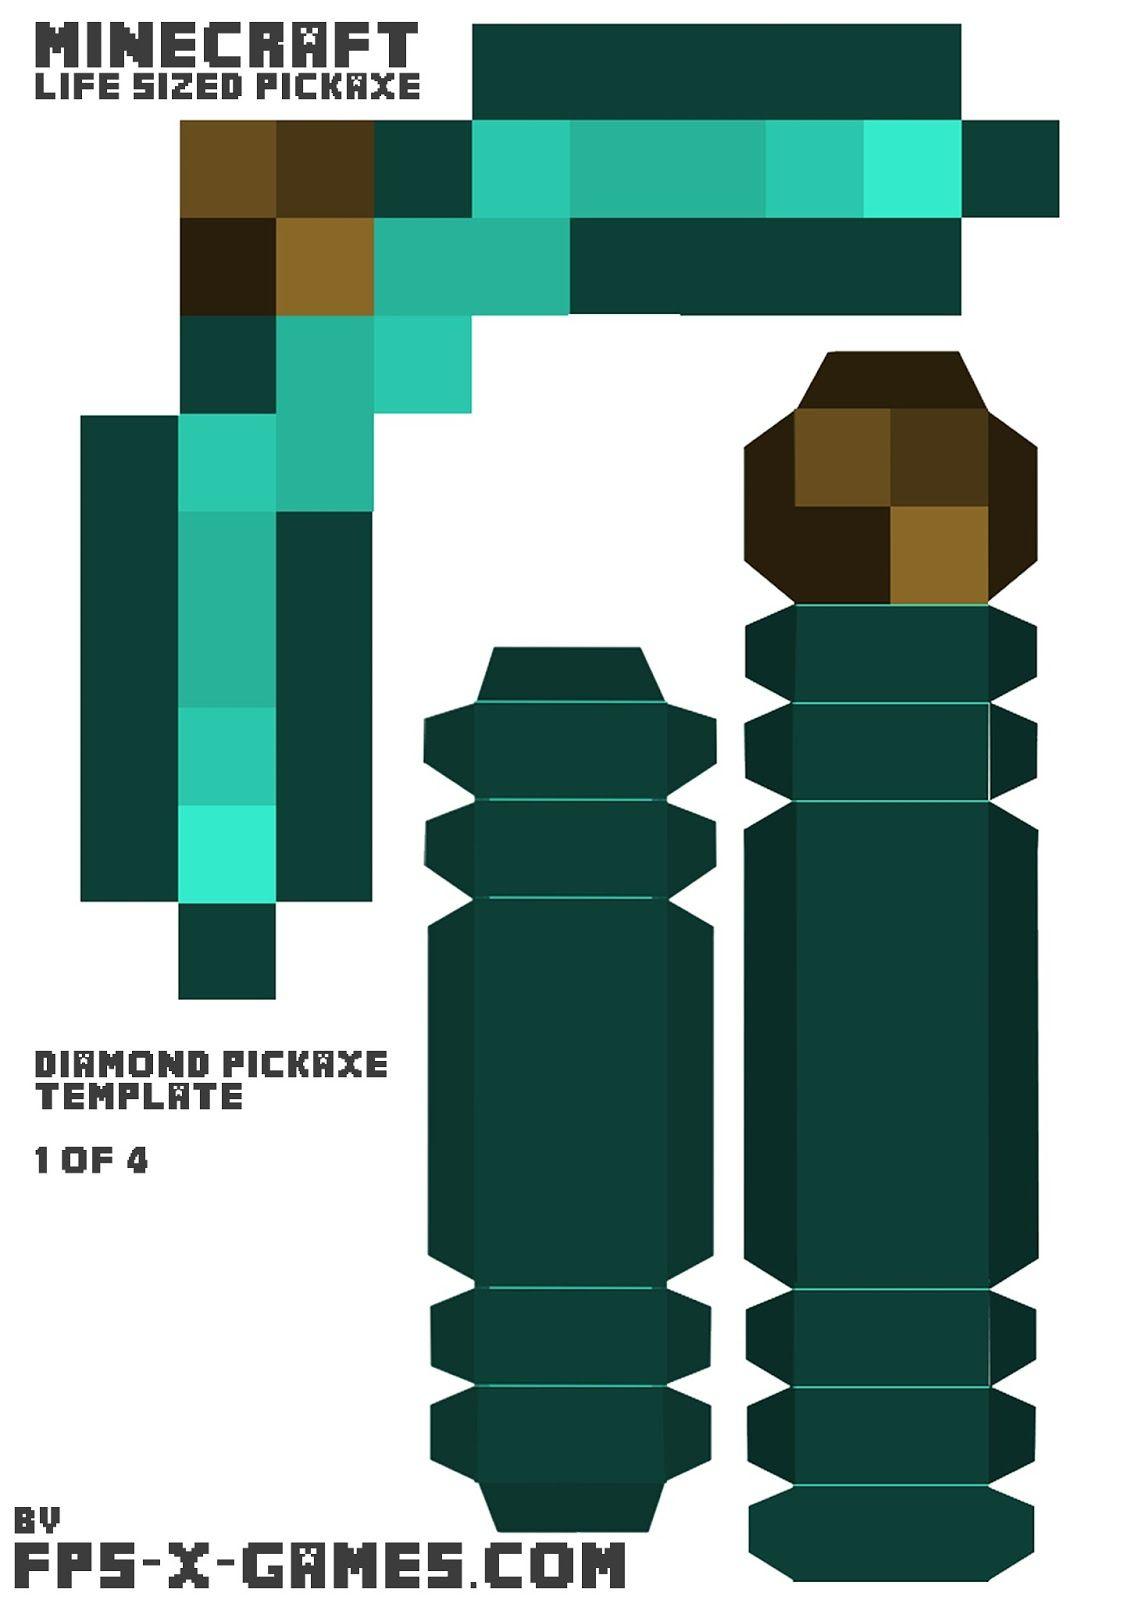 Minecraft-pickaxe-papercraft-template-1.png 1 131 × 1 600 pixels ...